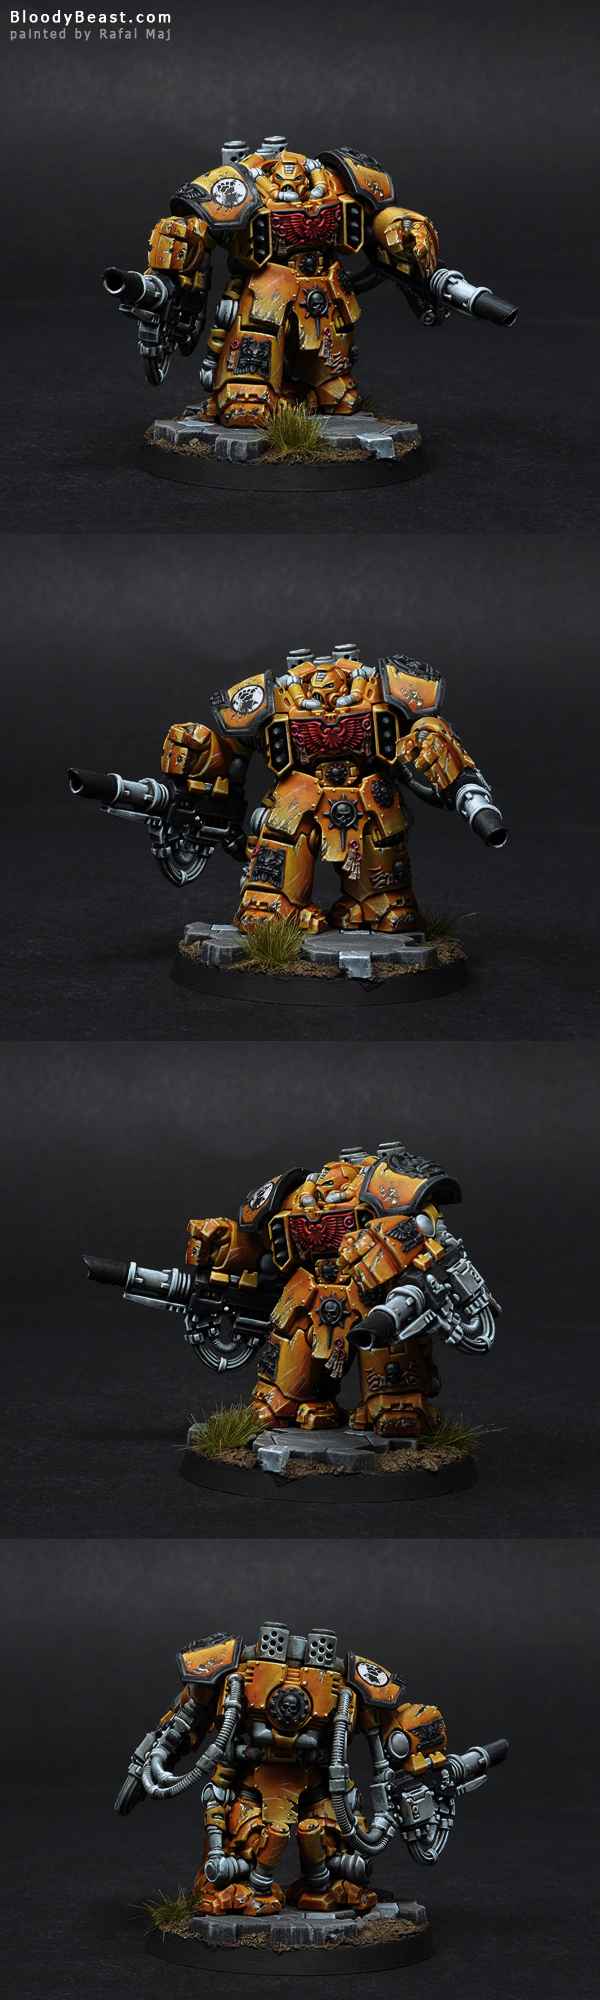 Imperial Fists Centurion Devastator painted by Rafal Maj (BloodyBeast.com)